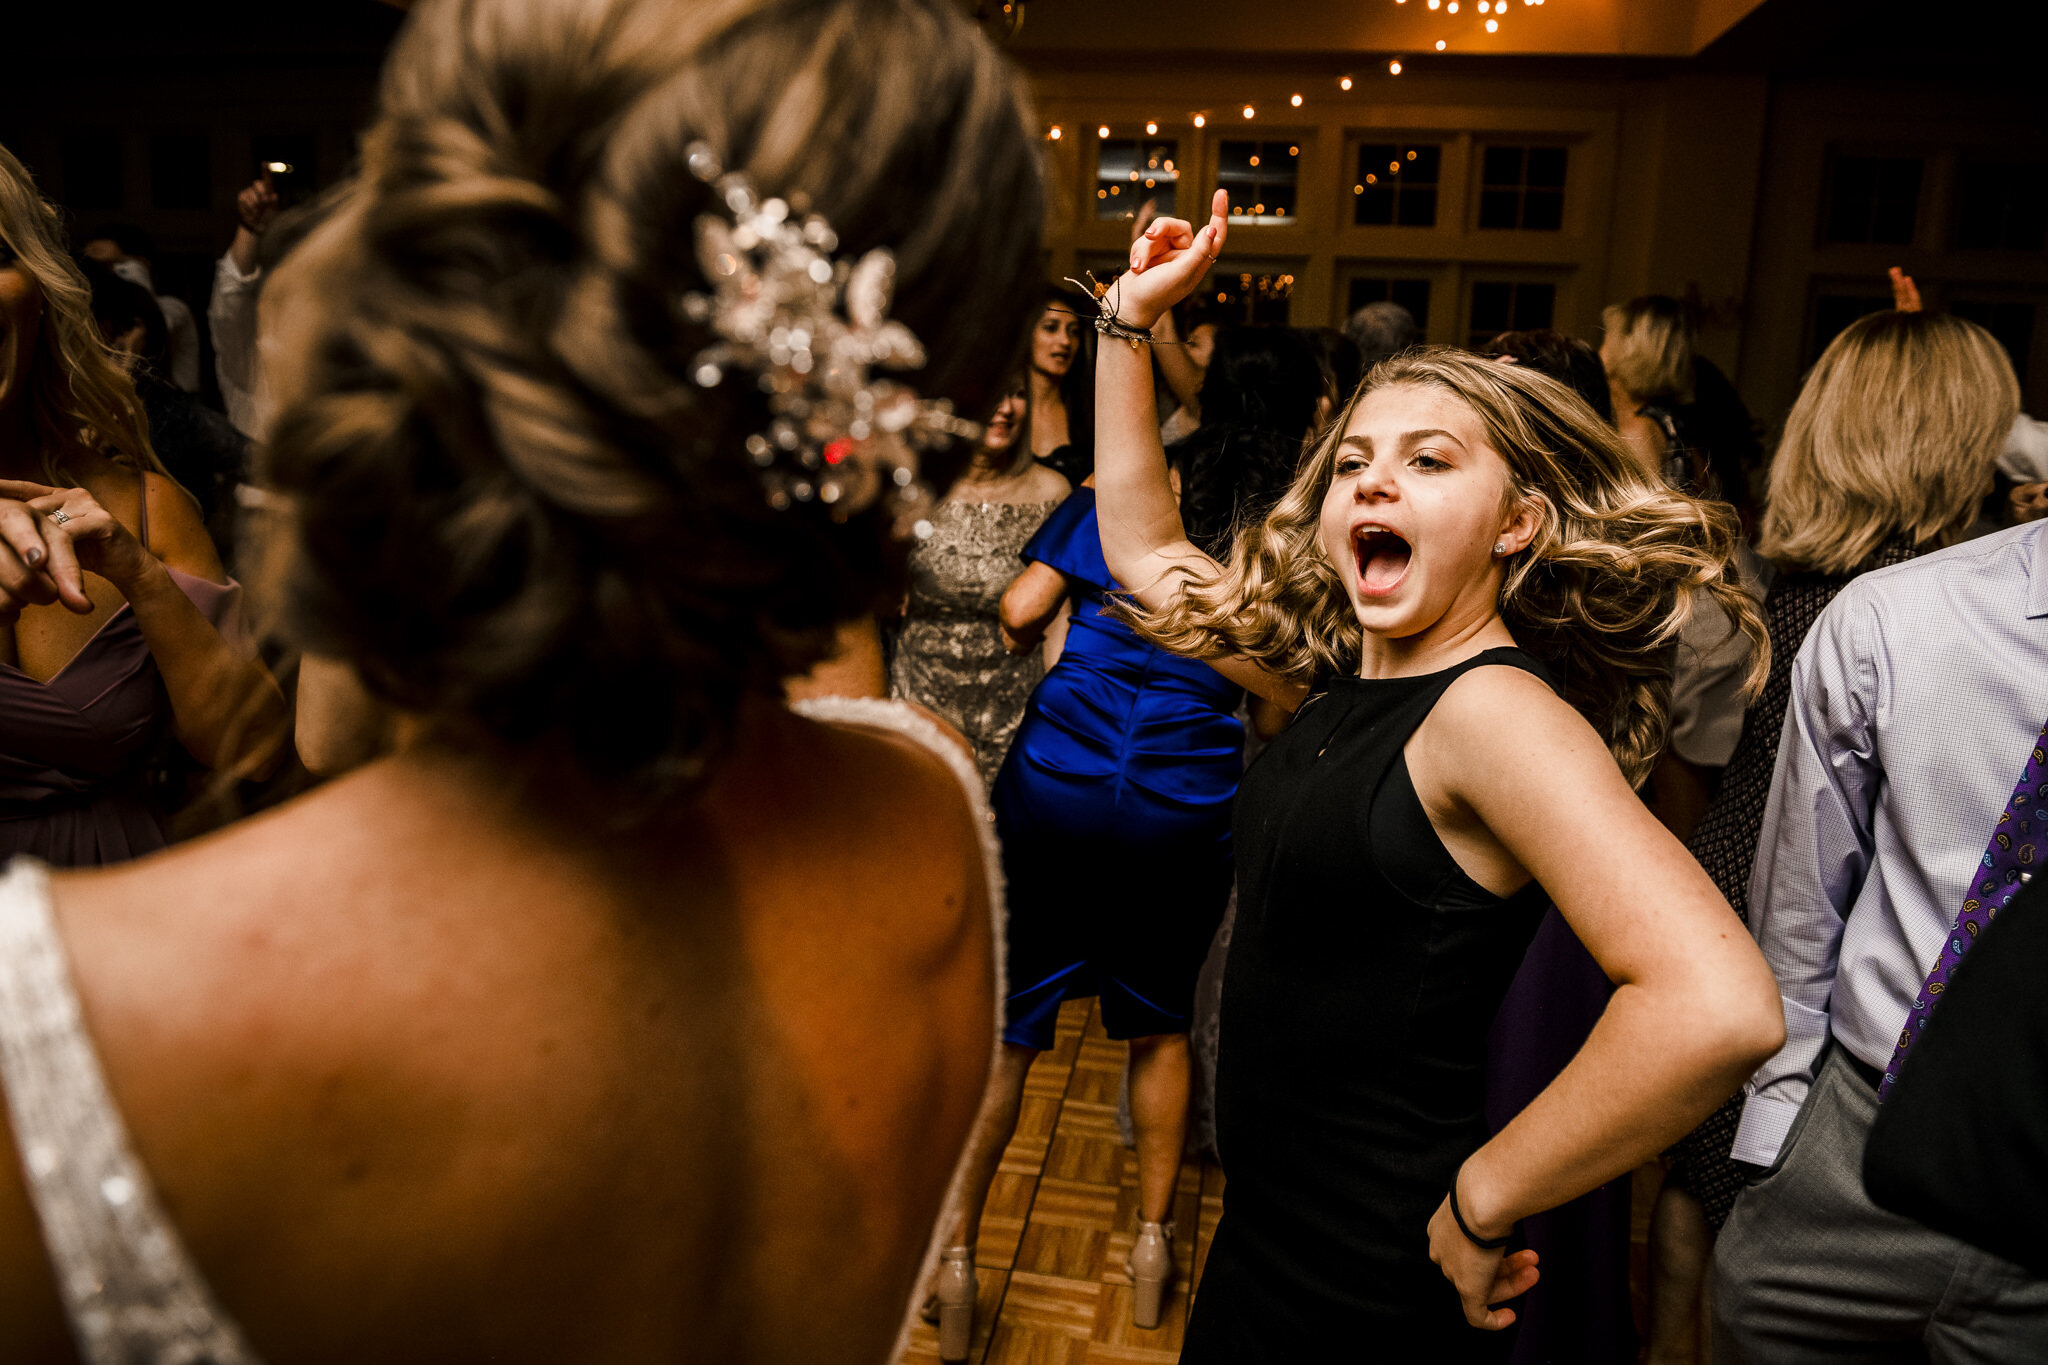 Coyle-Forsgate-Country-Club-Wedding-Photographer-51.JPG